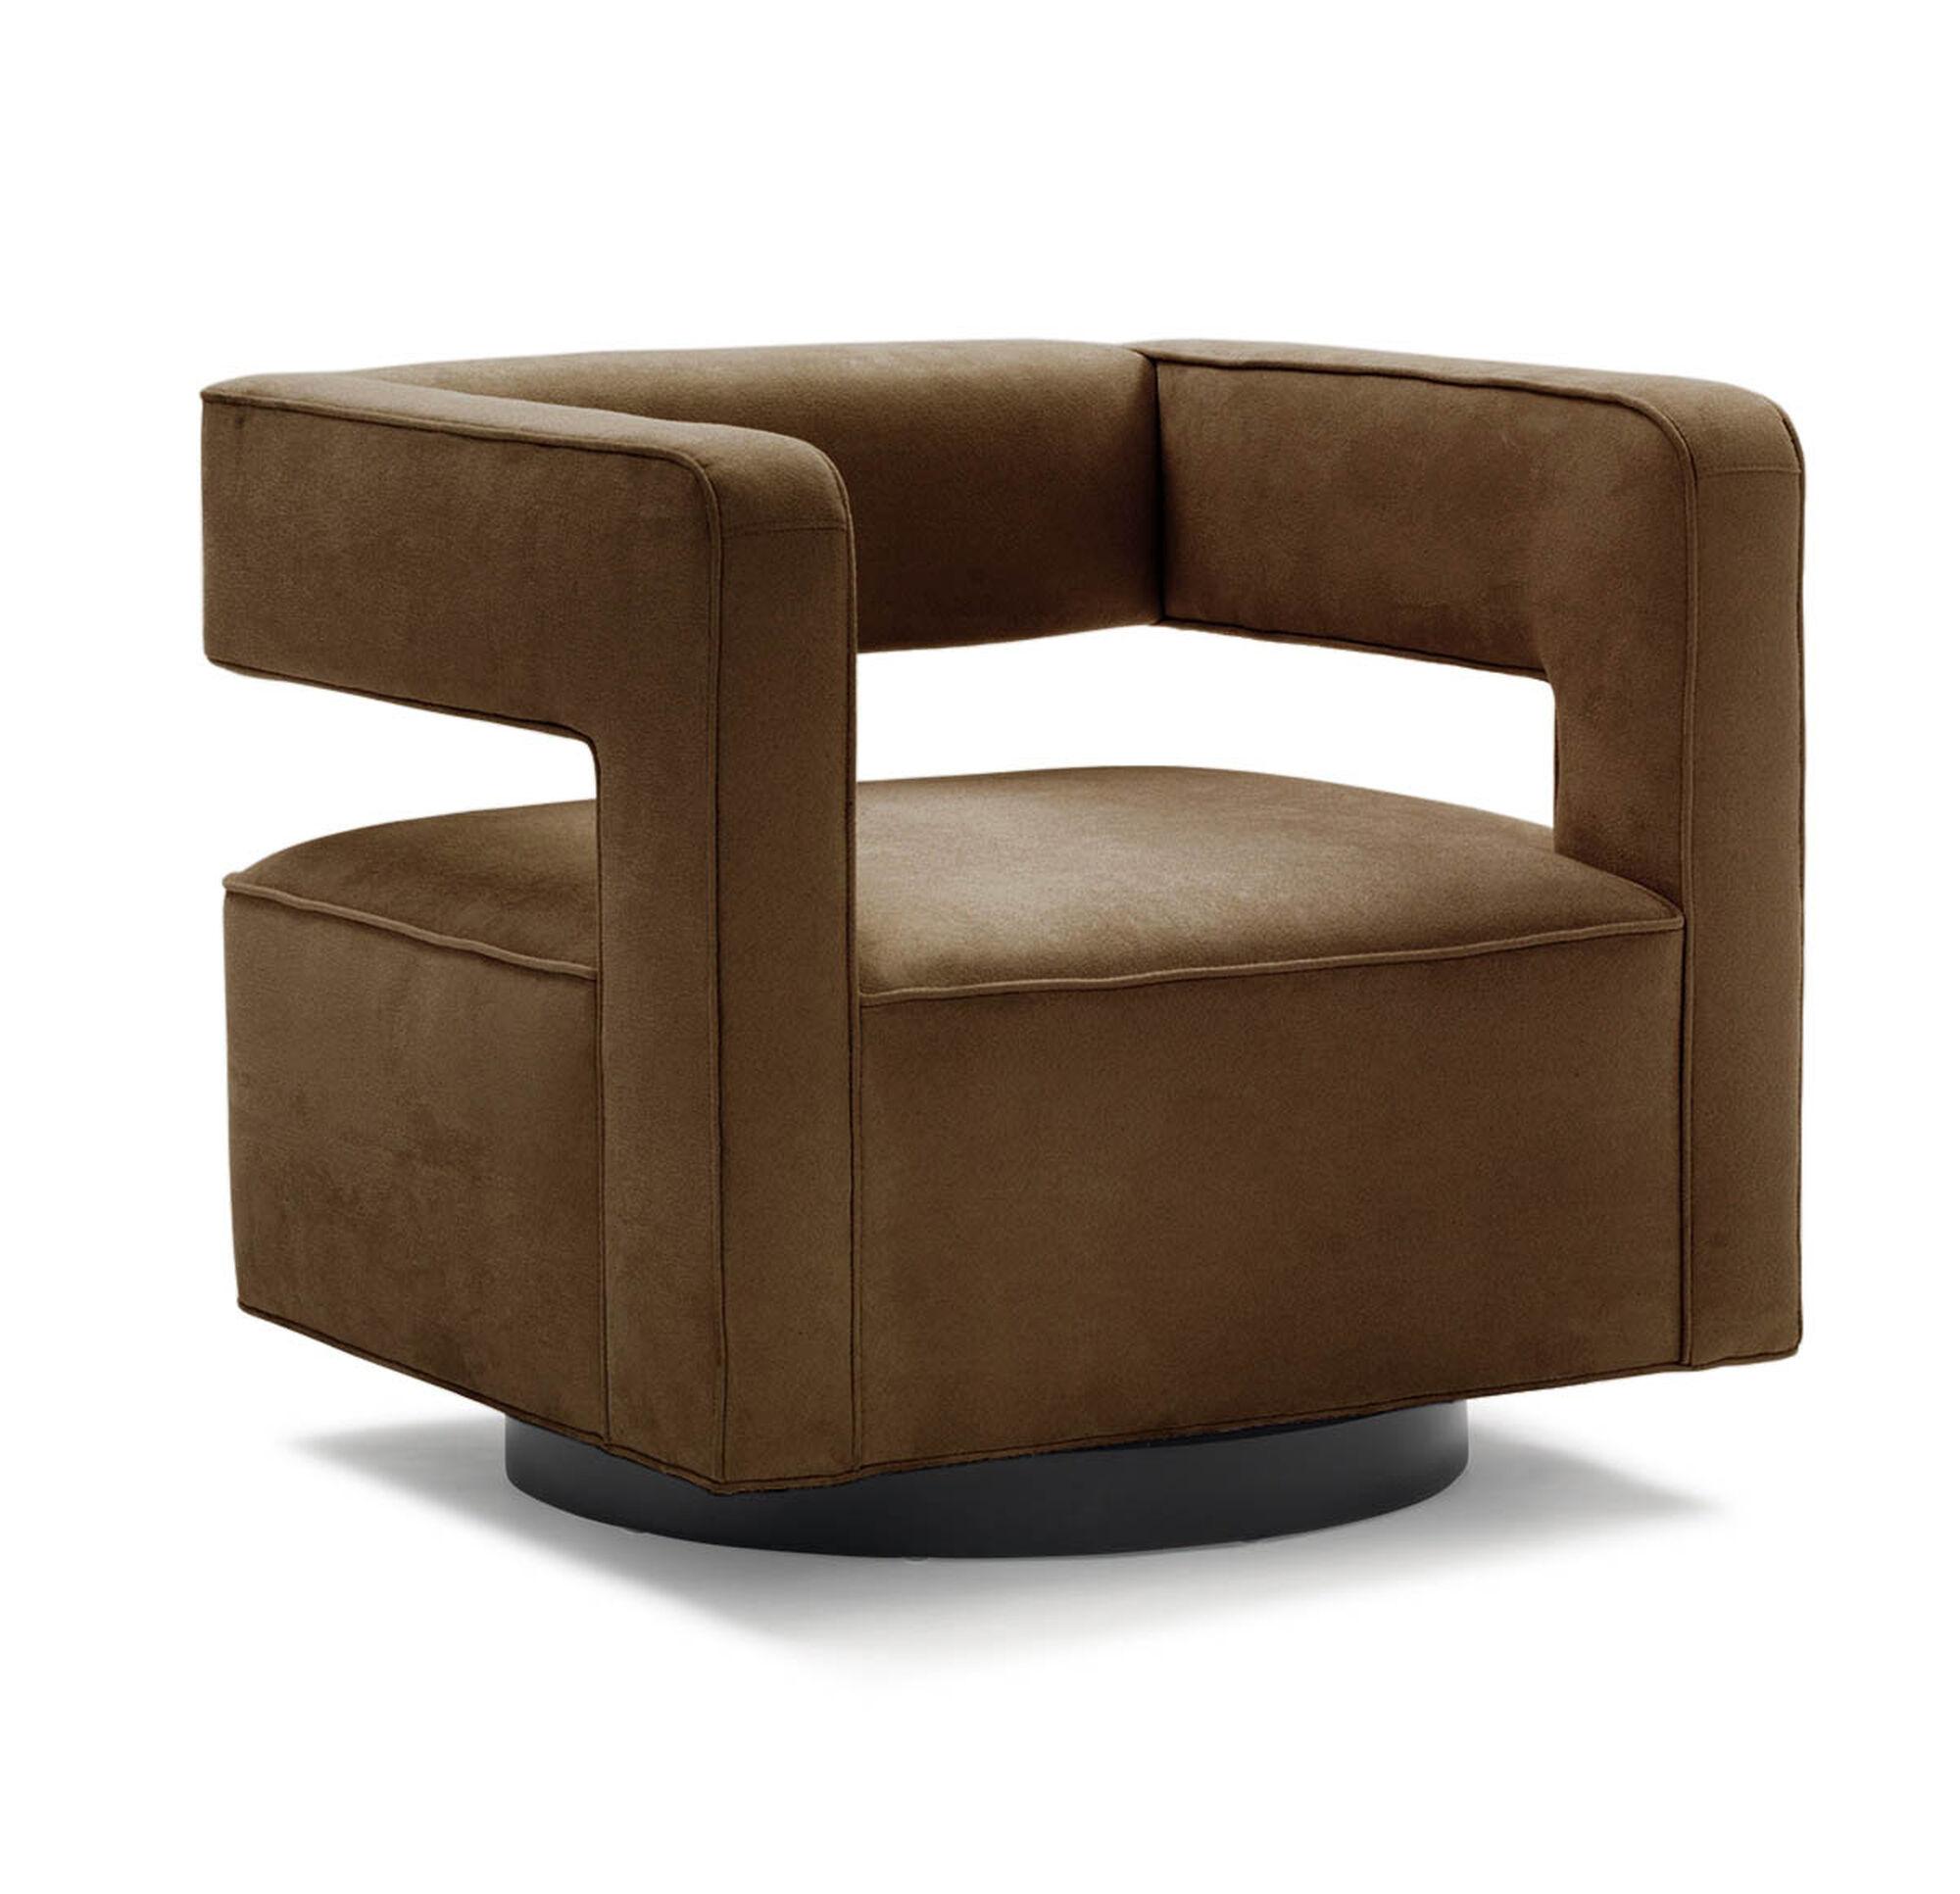 NICO FULL SWIVEL CHAIR  SOFT SUEDE   CHOCOLA  hi resNICO FULL SWIVEL CHAIR. Nico Counter Height Dining Stool. Home Design Ideas